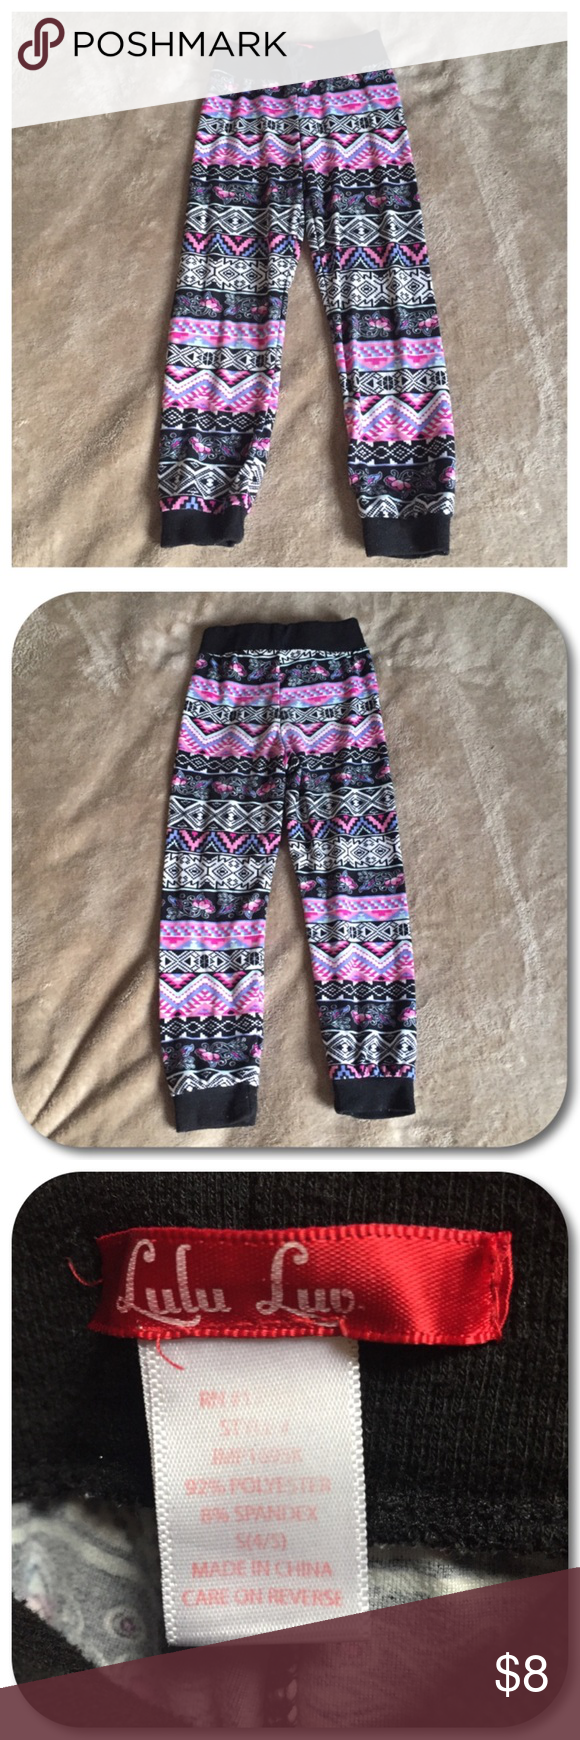 2586c46ad Lulu Luv Jogger Pants Lulu Luv Aztec print jogger pants. Girl size small (4  5). Black